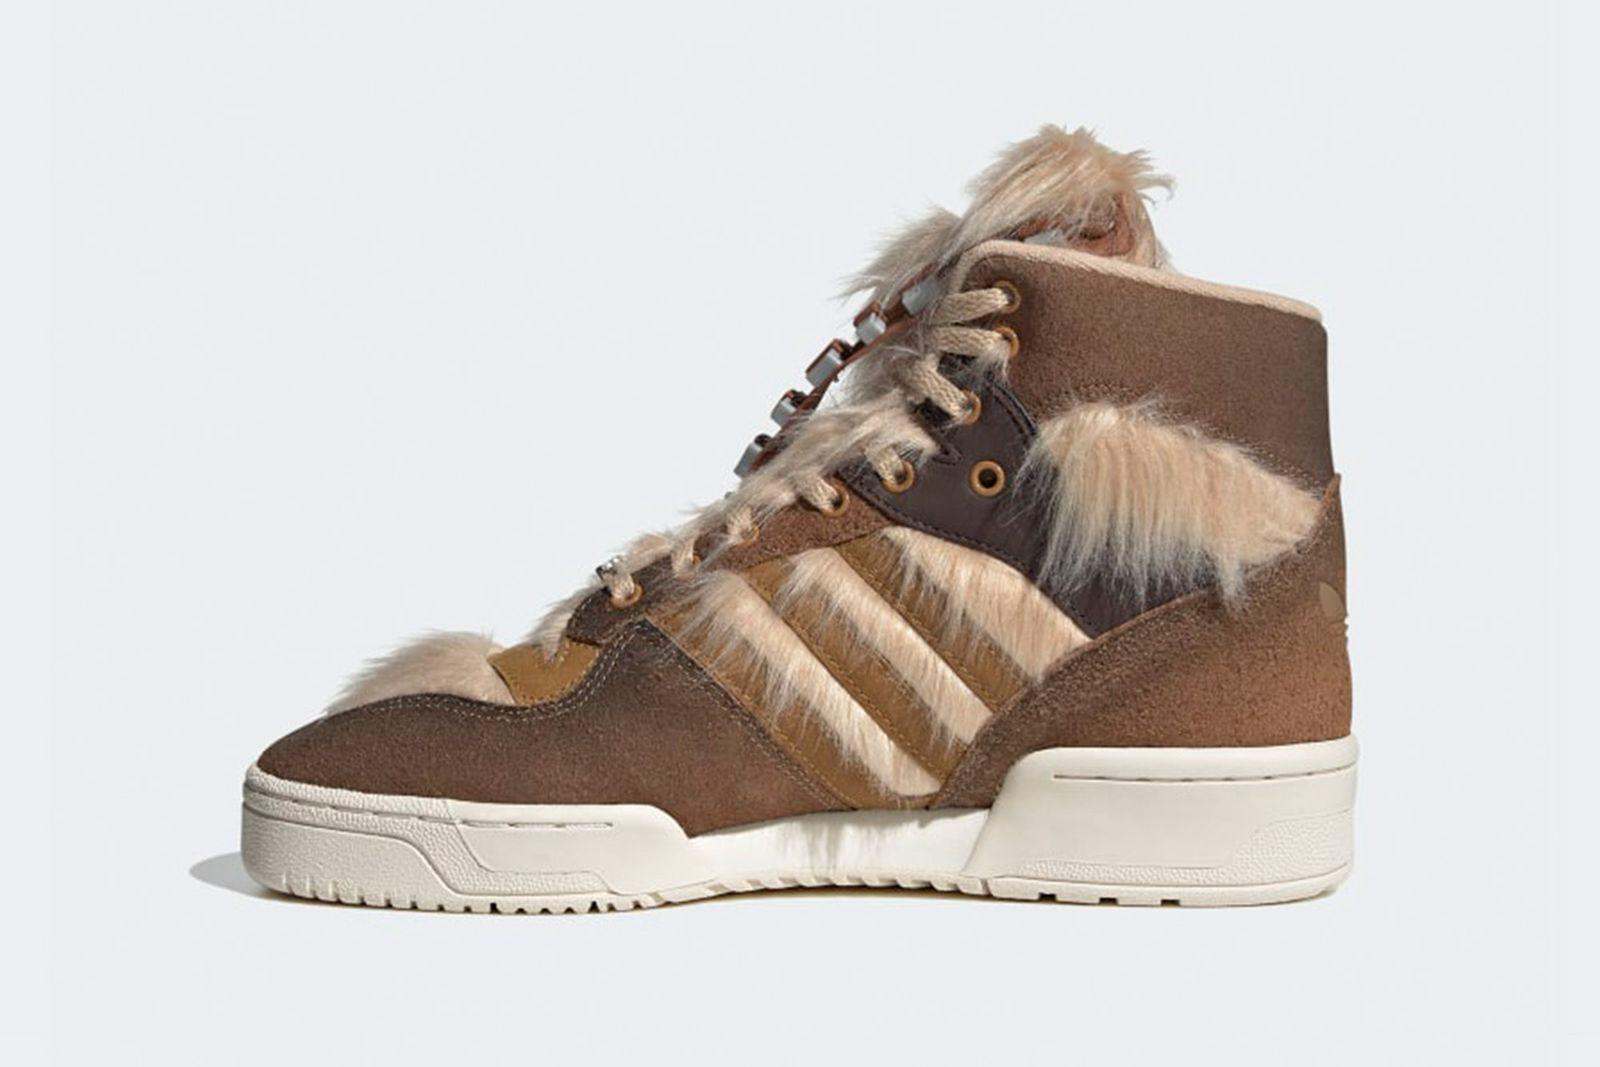 star-wars-adidas-rivalry-hi-chewbacca-release-date-price-01